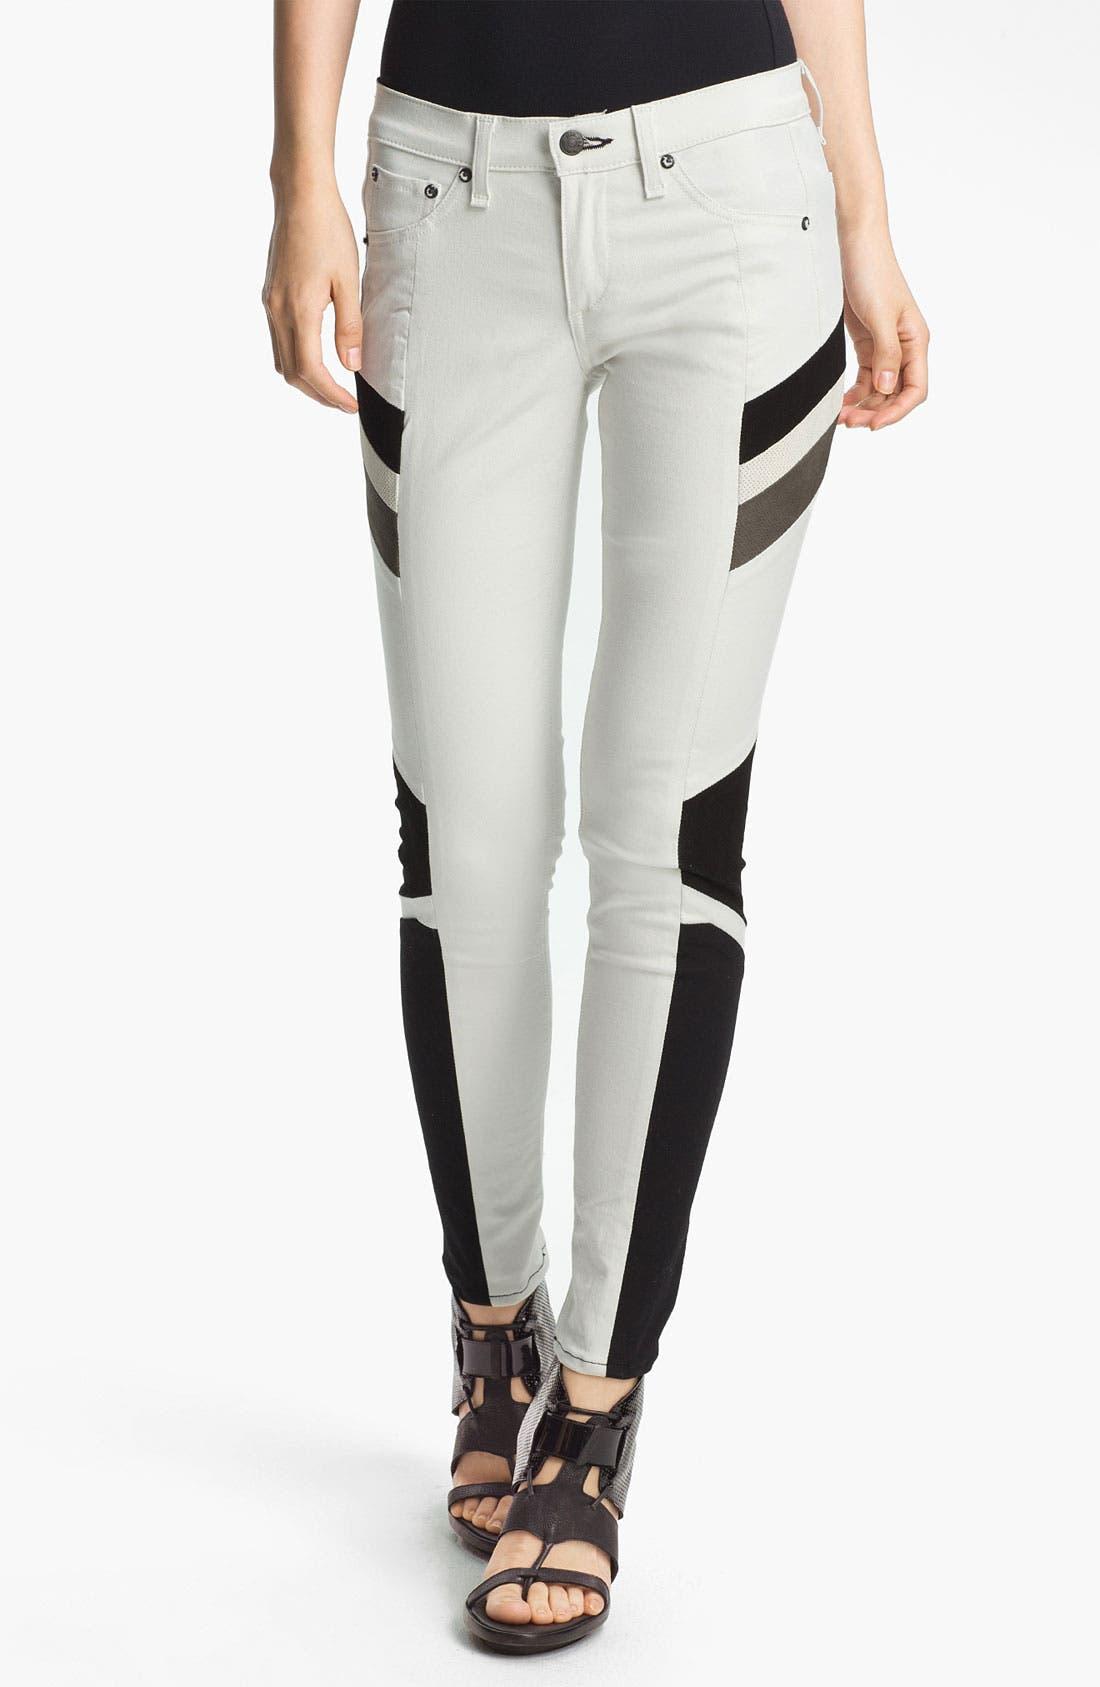 Main Image - rag & bone/JEAN 'Halifox' Leggings